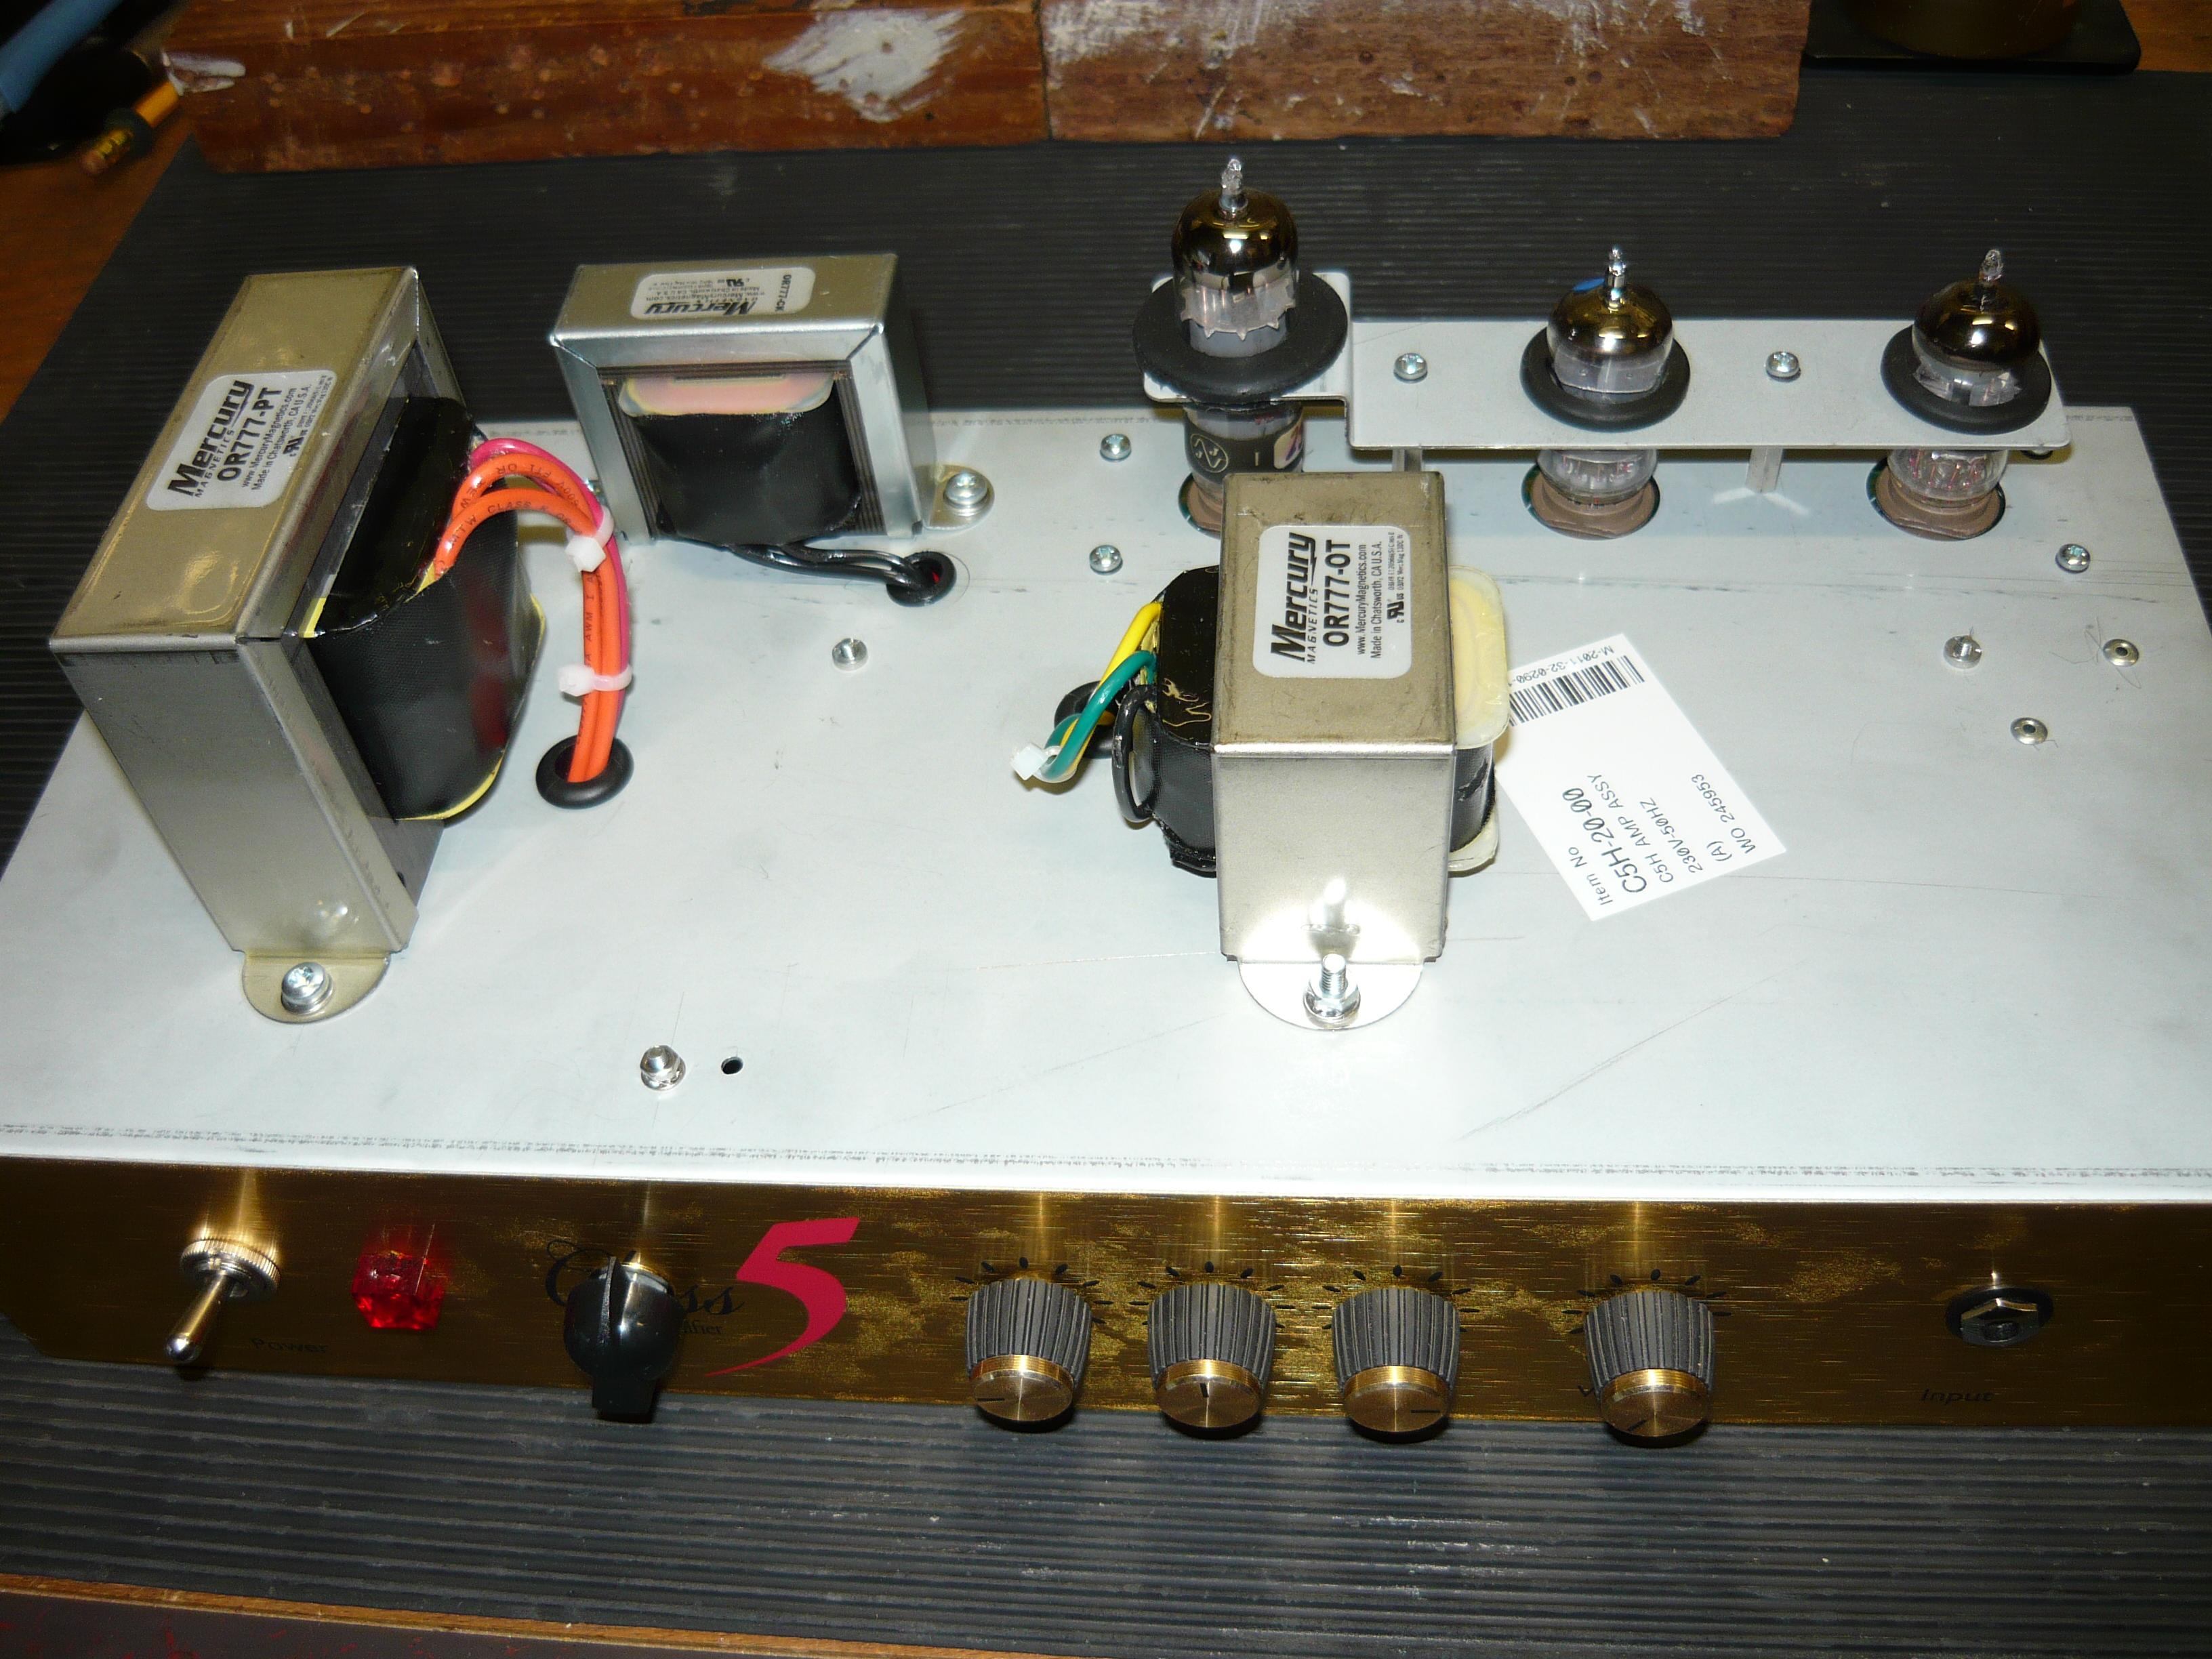 MODs to the Marshall Class 5 amplifier | ivanrichards